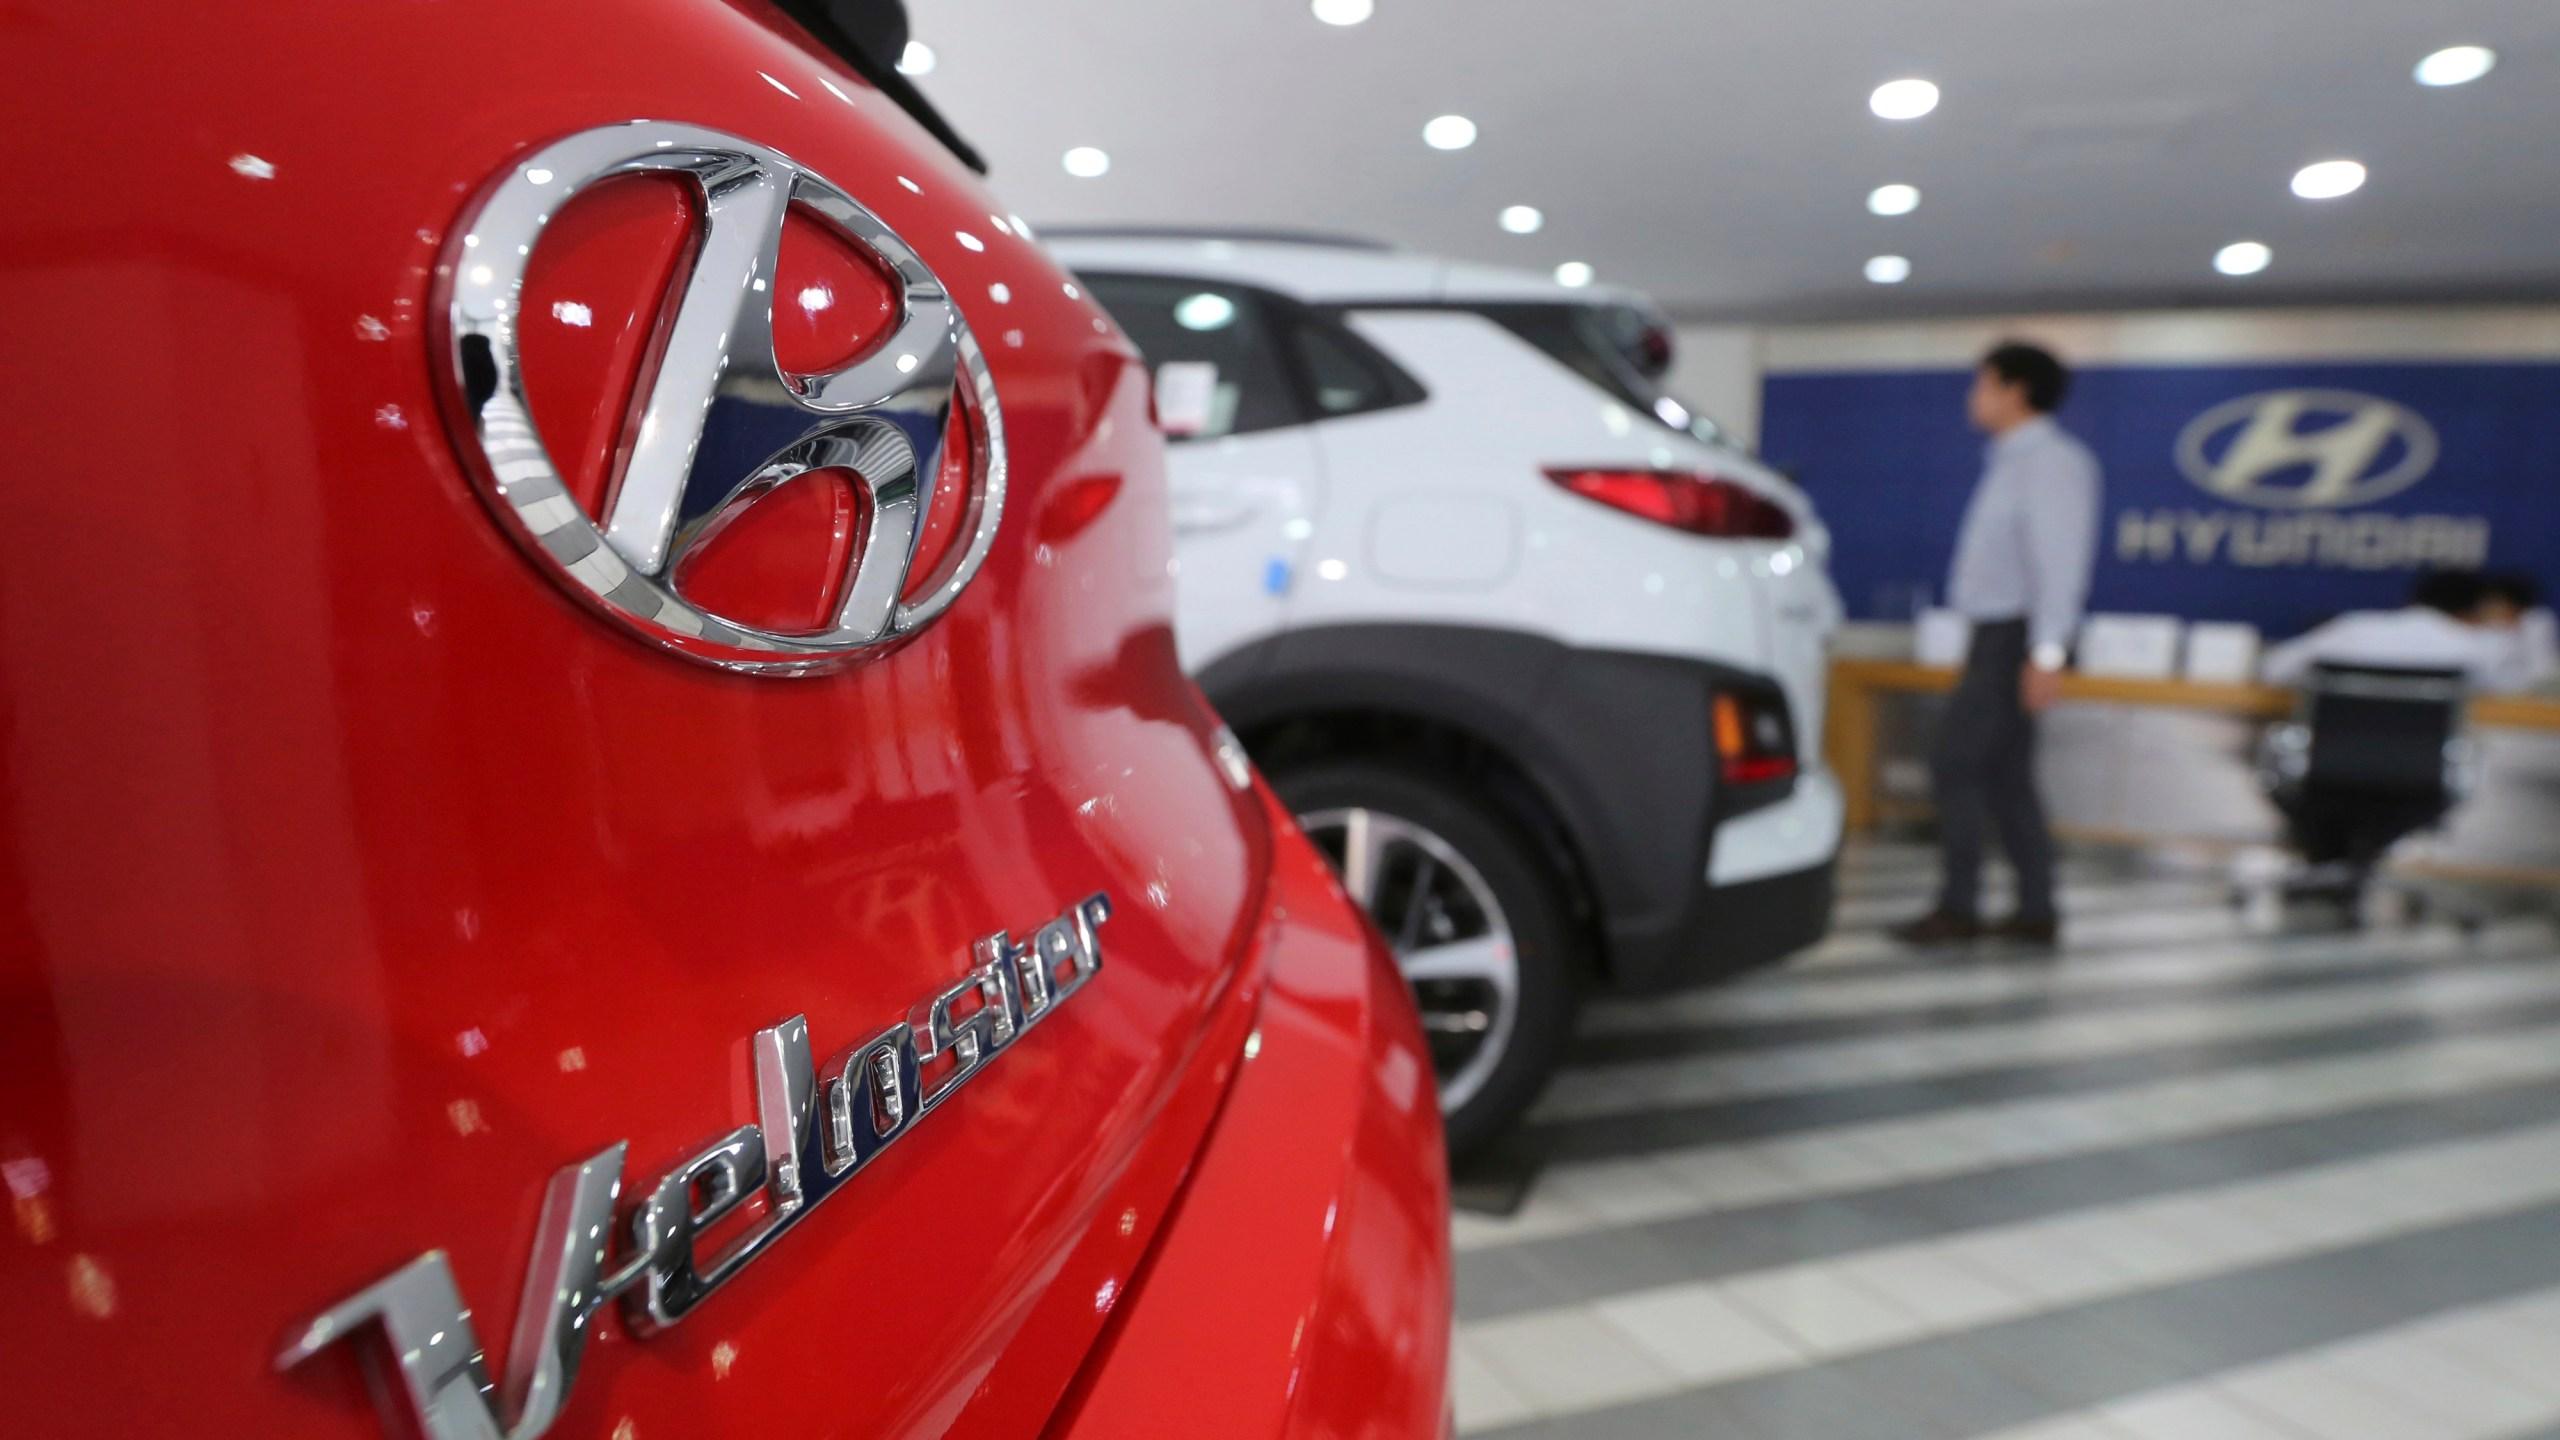 South_Korea_Earns_Hyundai_Motor_11284-159532.jpg82133320